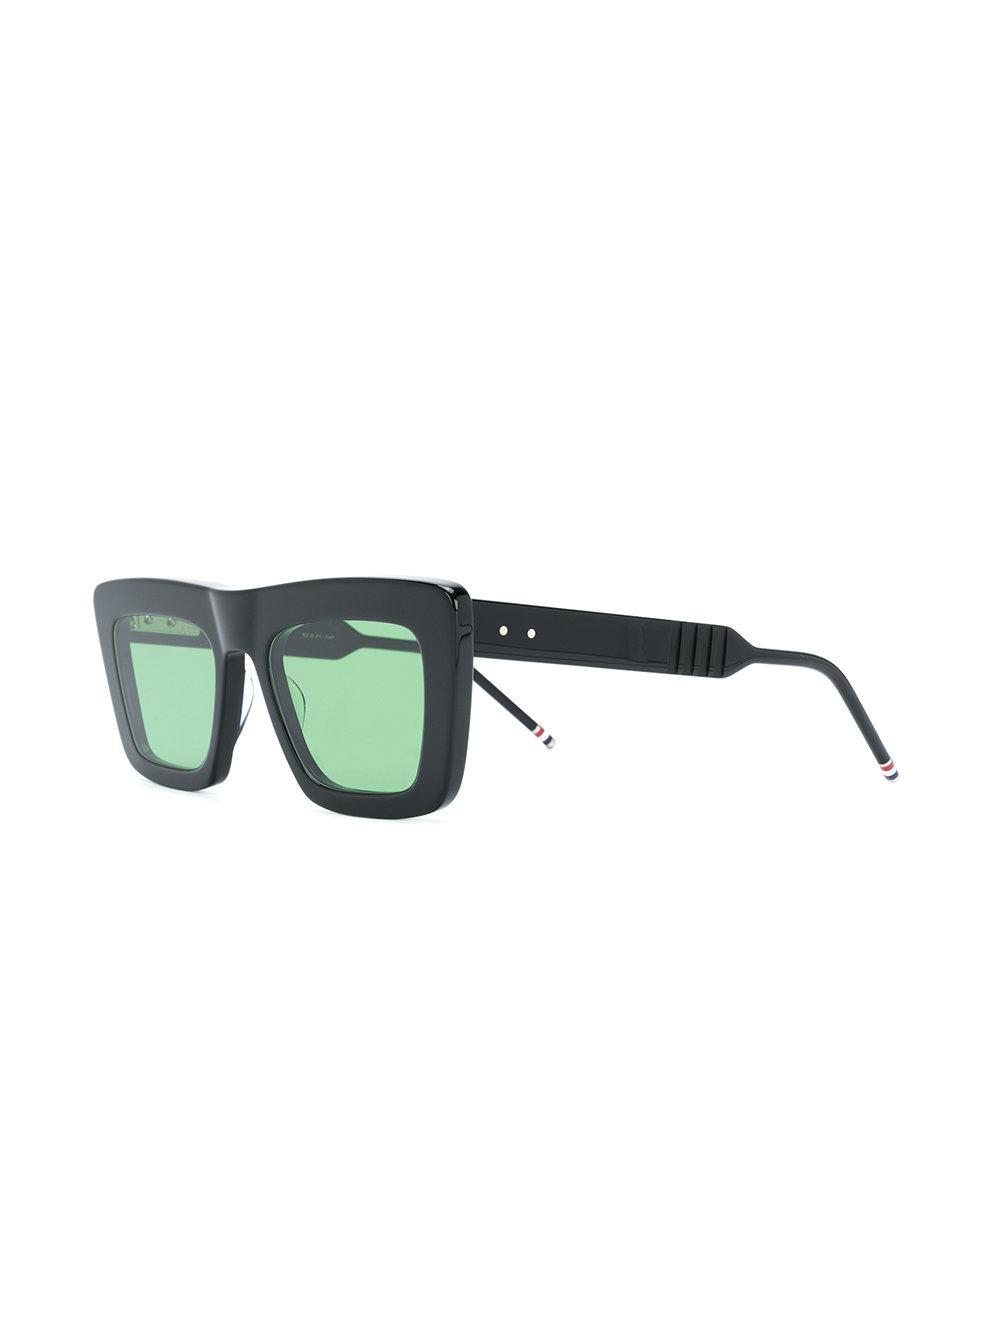 f20bdd144ef Lyst - Thom Browne Square Sunglasses in Black